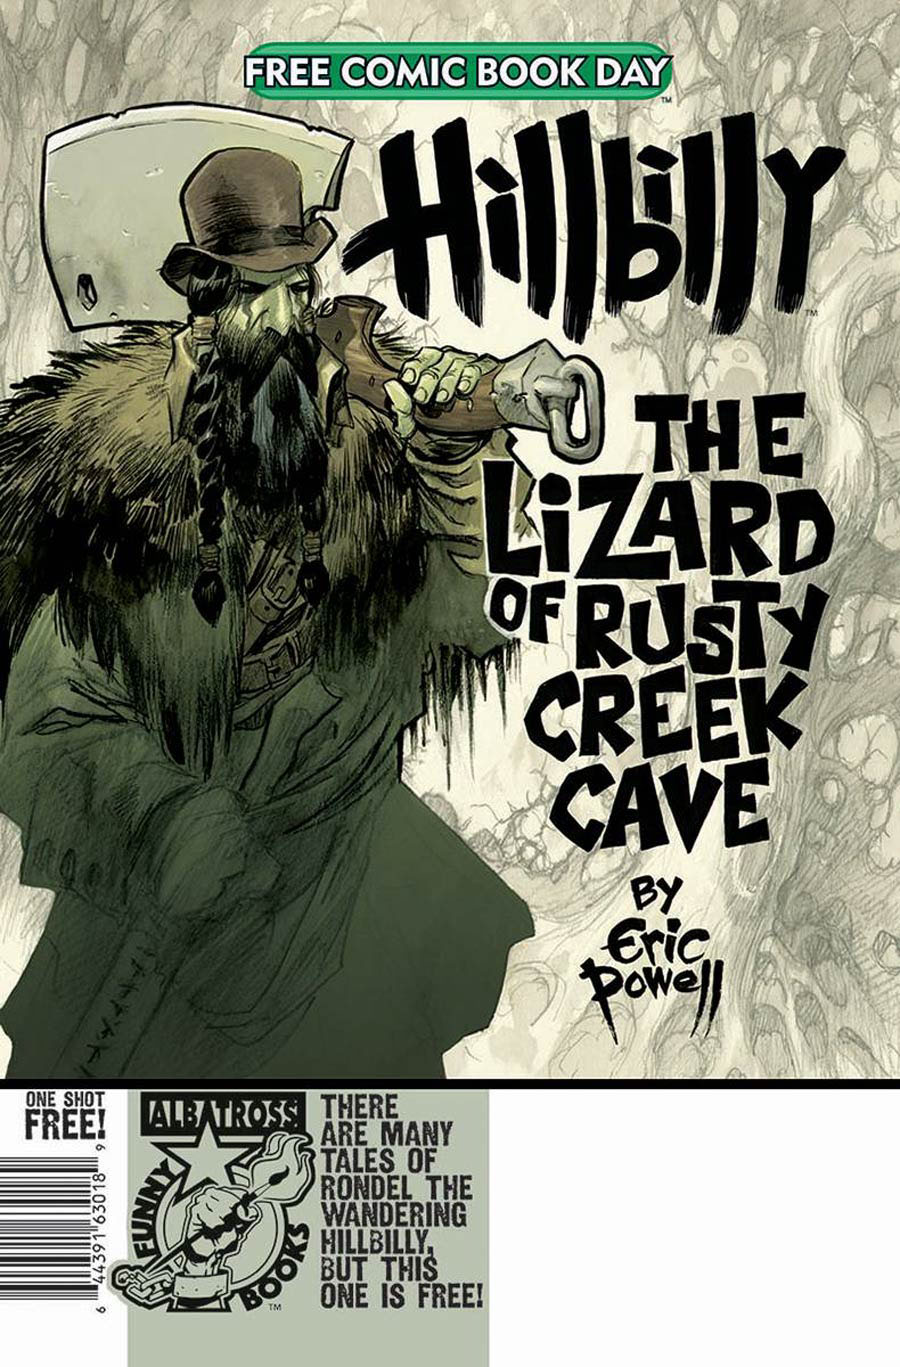 Hillbilly The Lizard Of Rusty Creek Cave FCBD 2020